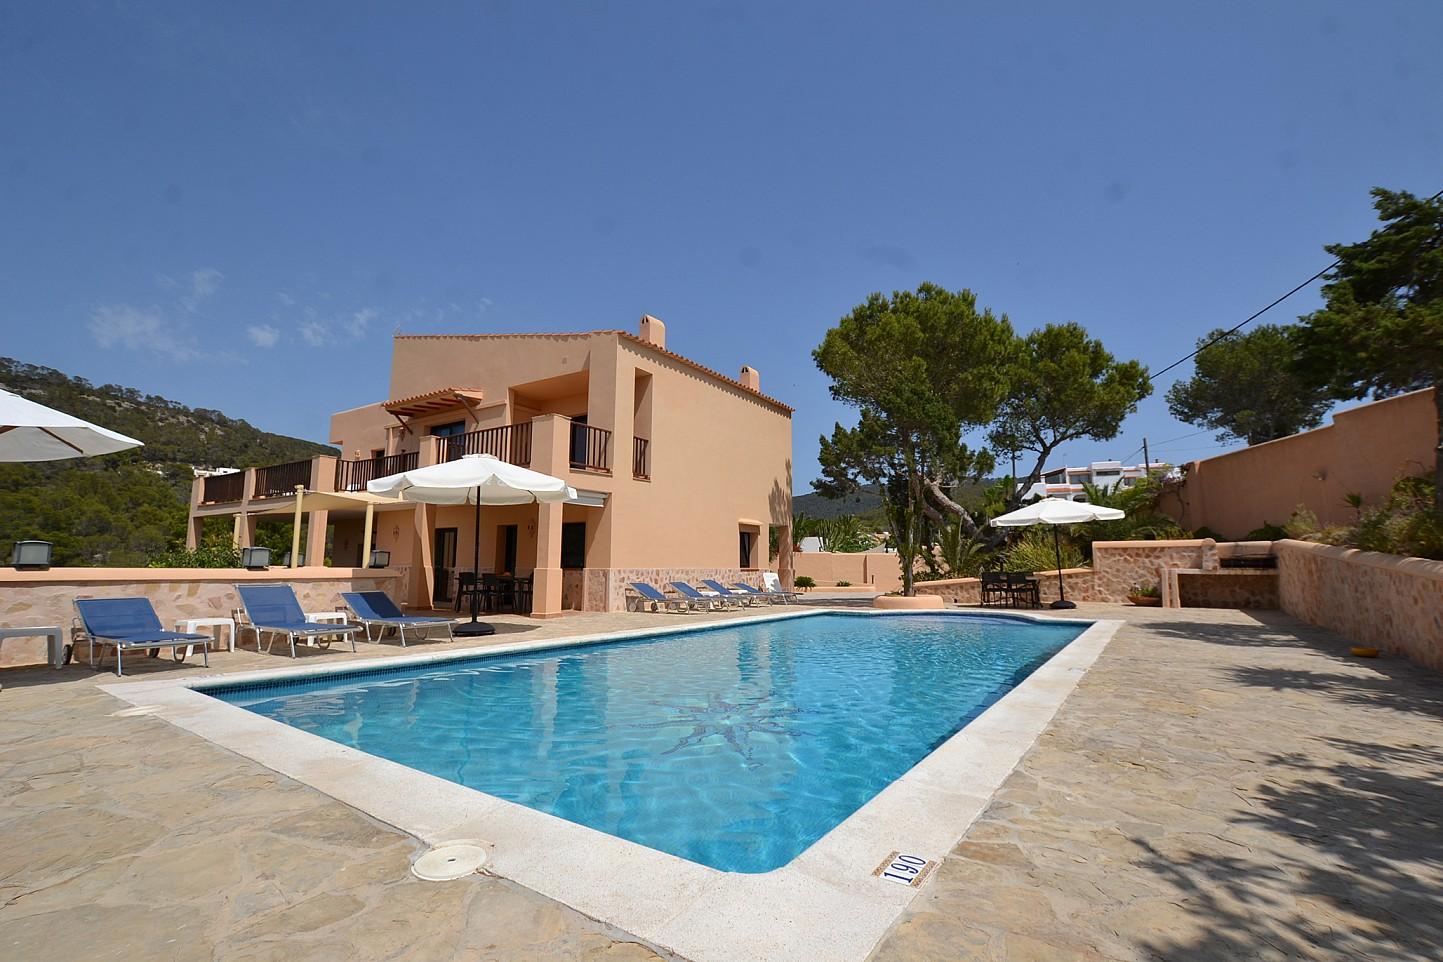 Gran piscina en la terraza